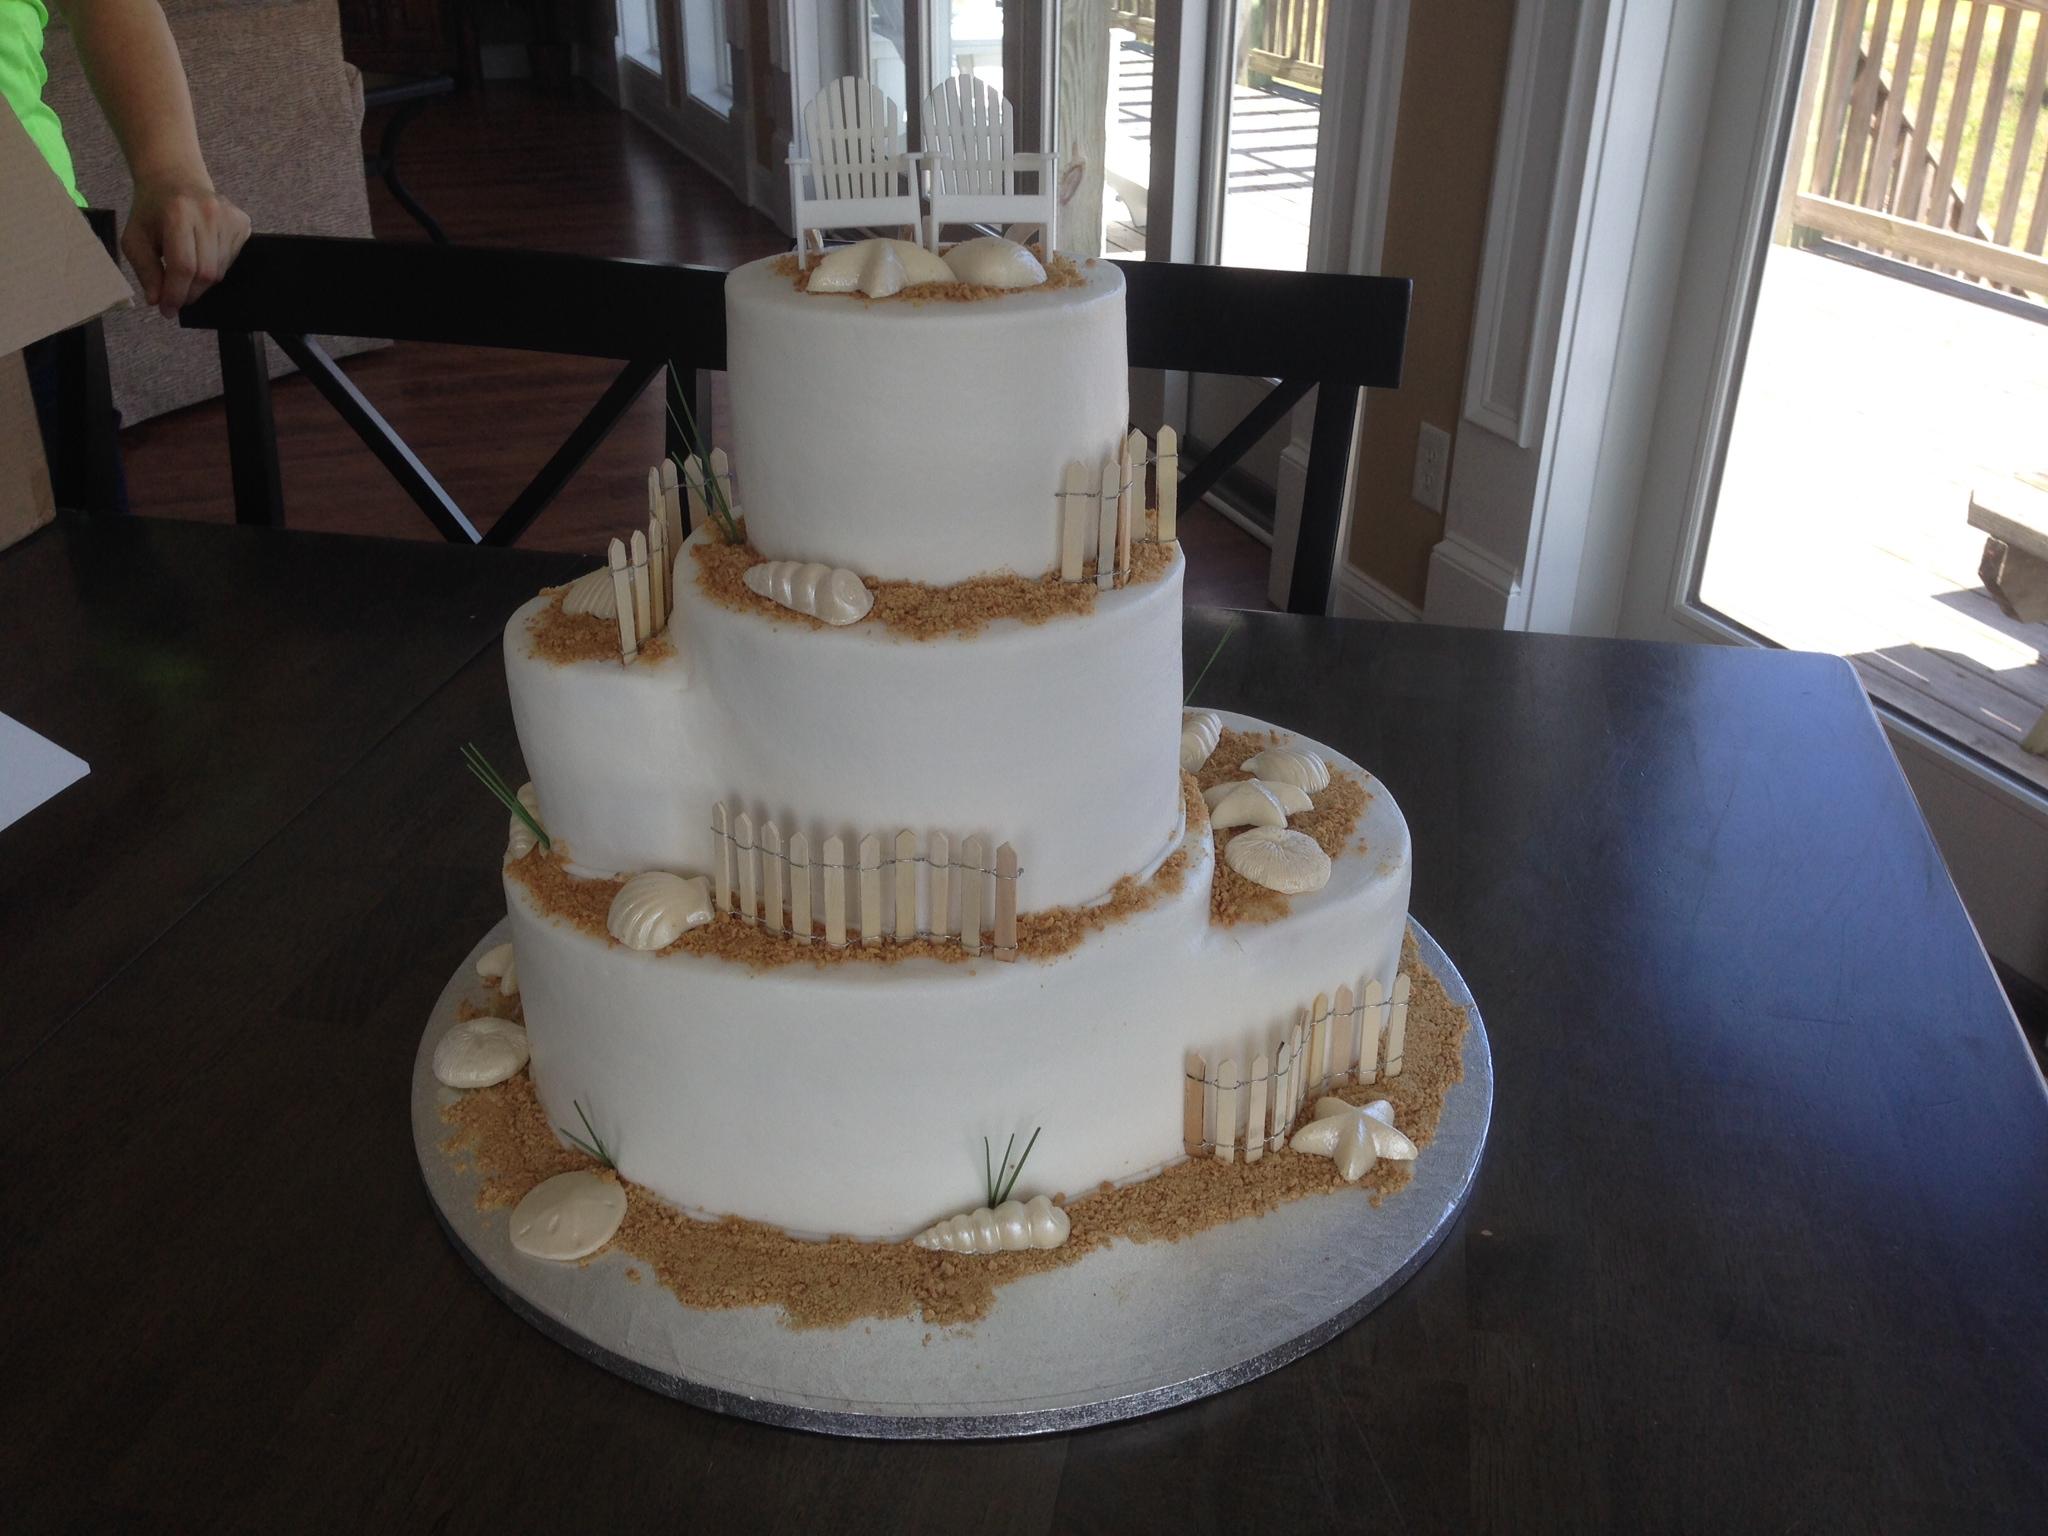 K & S Cakes, Leesburg VA